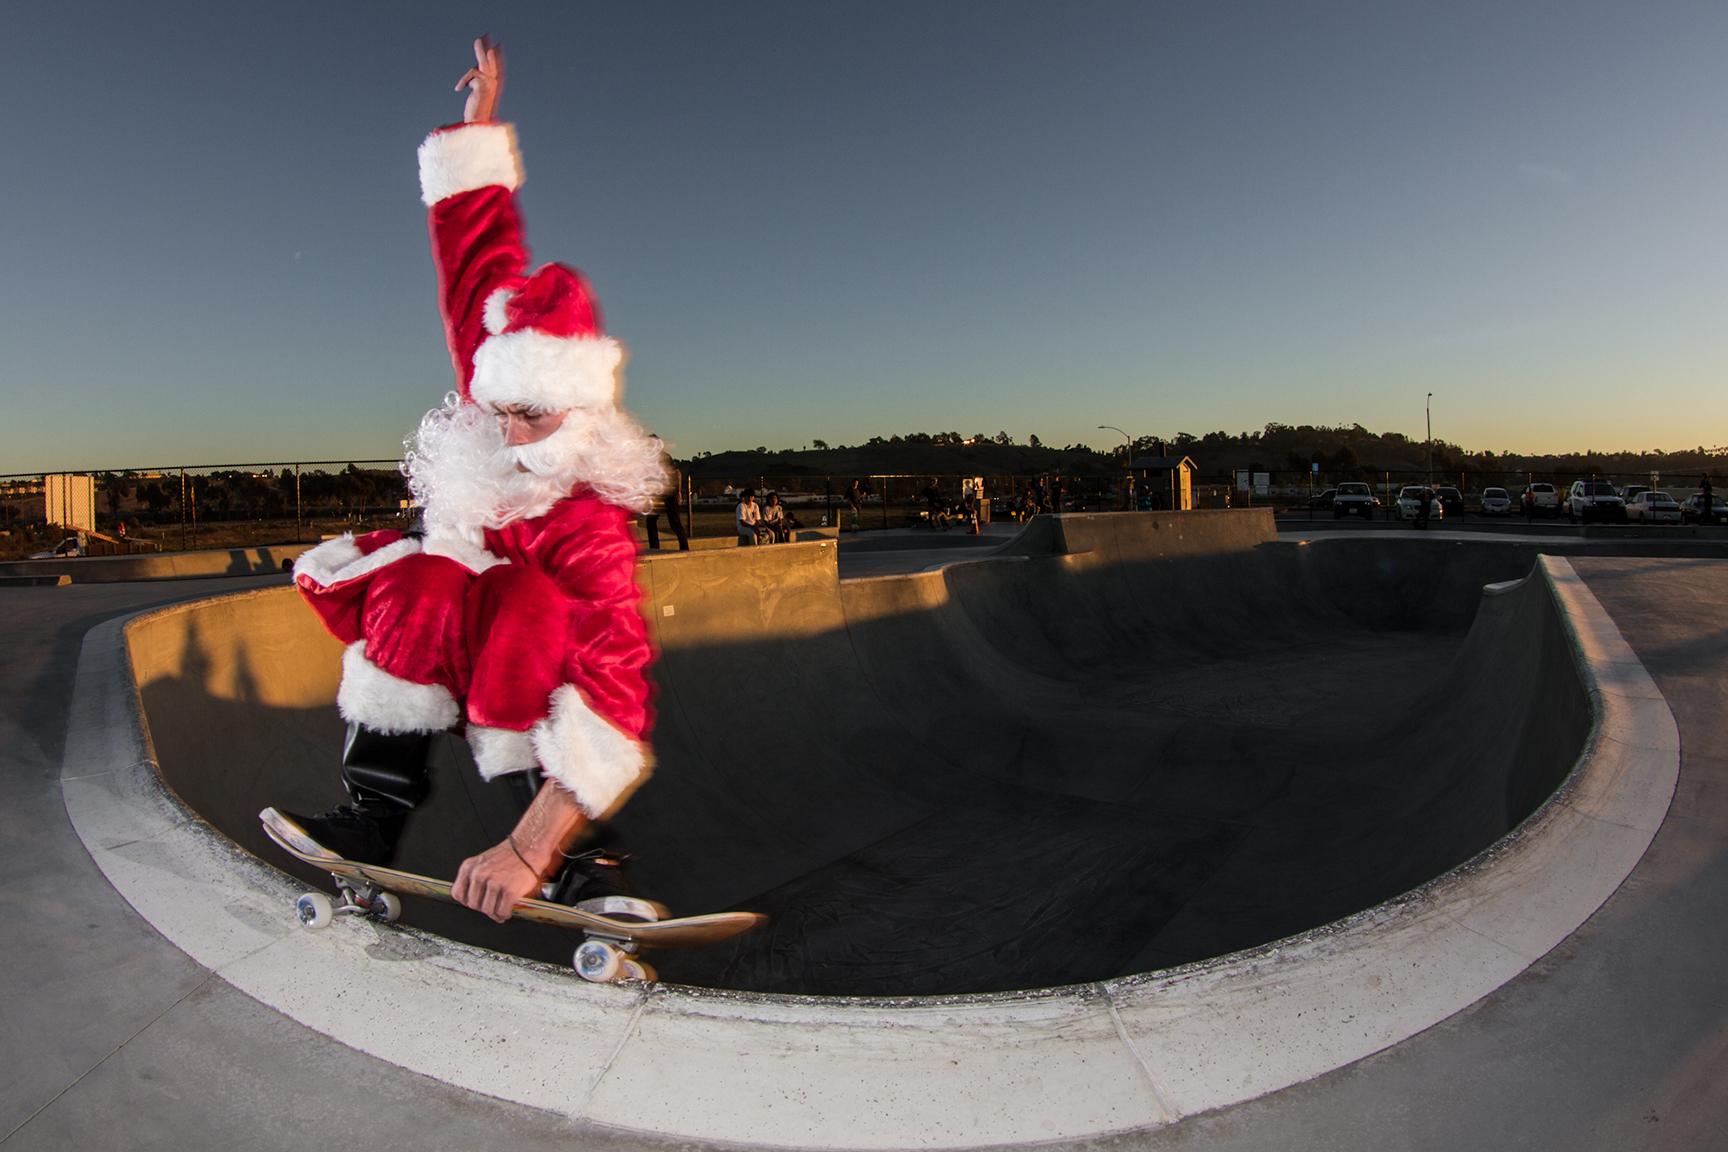 Slob Grind Gallery Santa Claus The Skateboarder X Click Santa Claus Skateboard